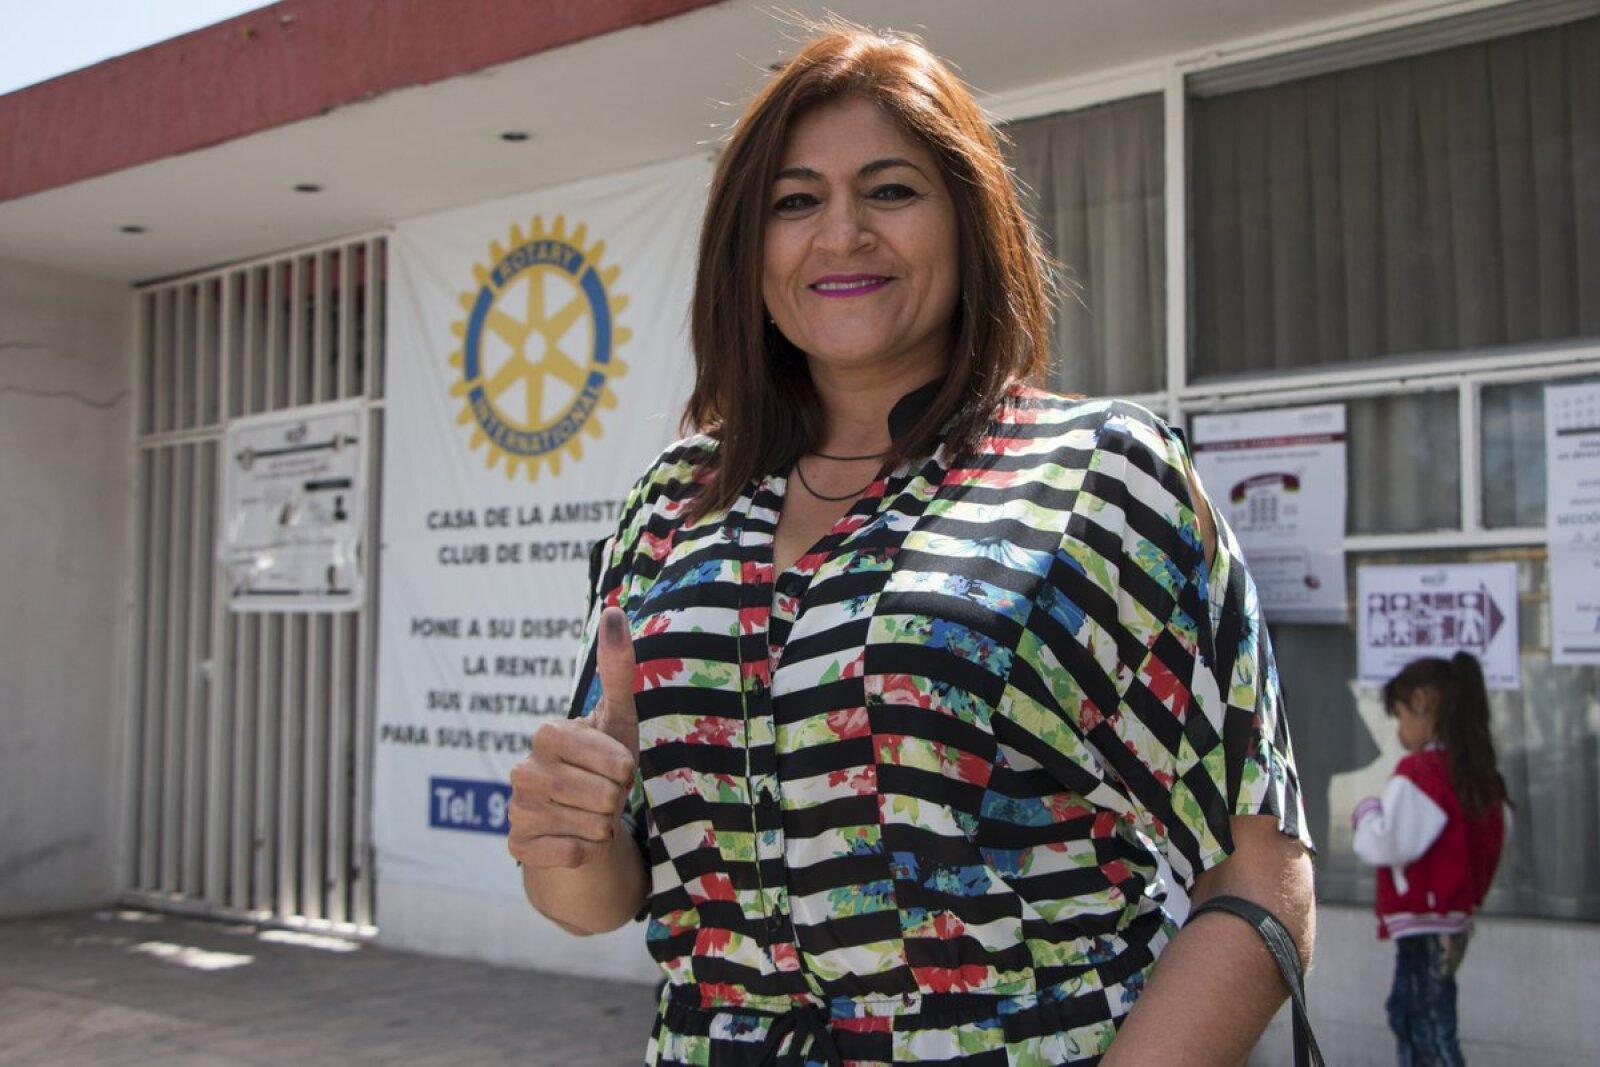 Por la mañana, la candidata de Morena en Aguascalientes, Nora Ruvalcaba, votó en la capital del estado.